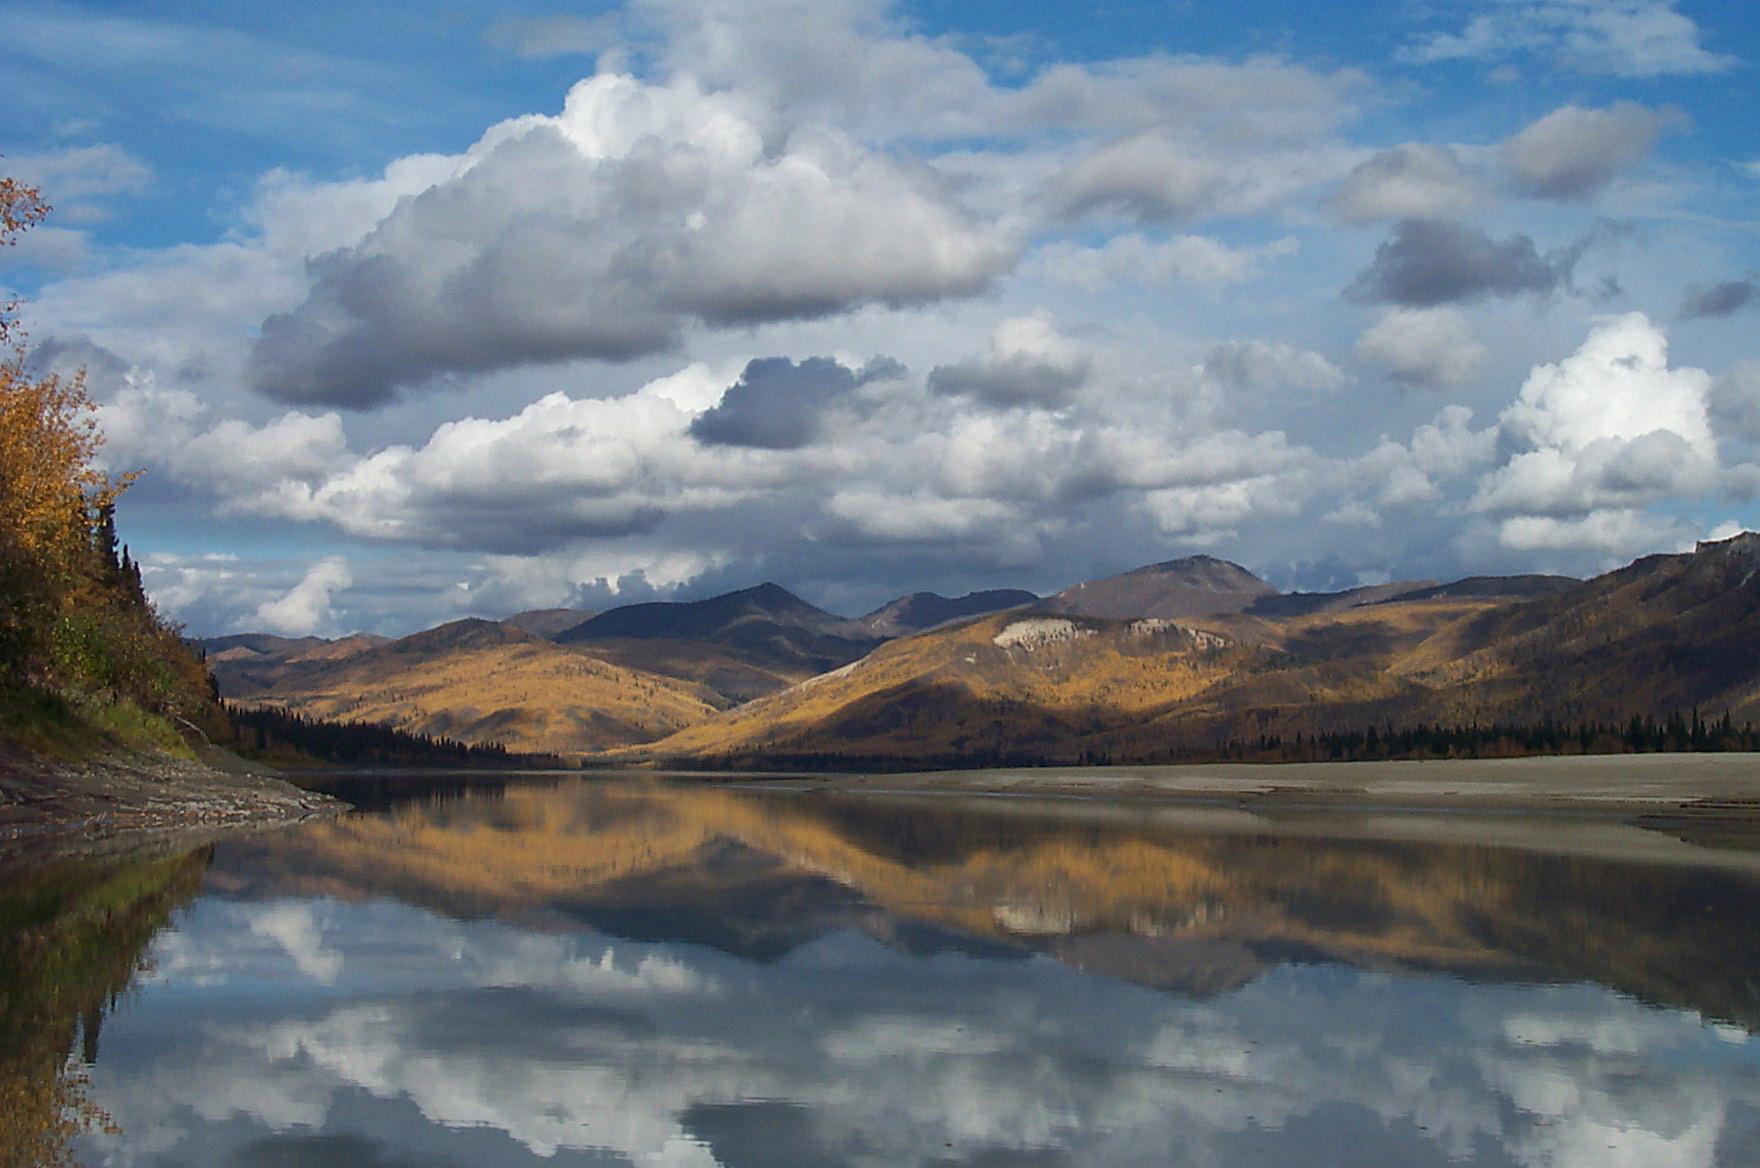 HEAPHY_Fall Reflections on the Yukon.jpg